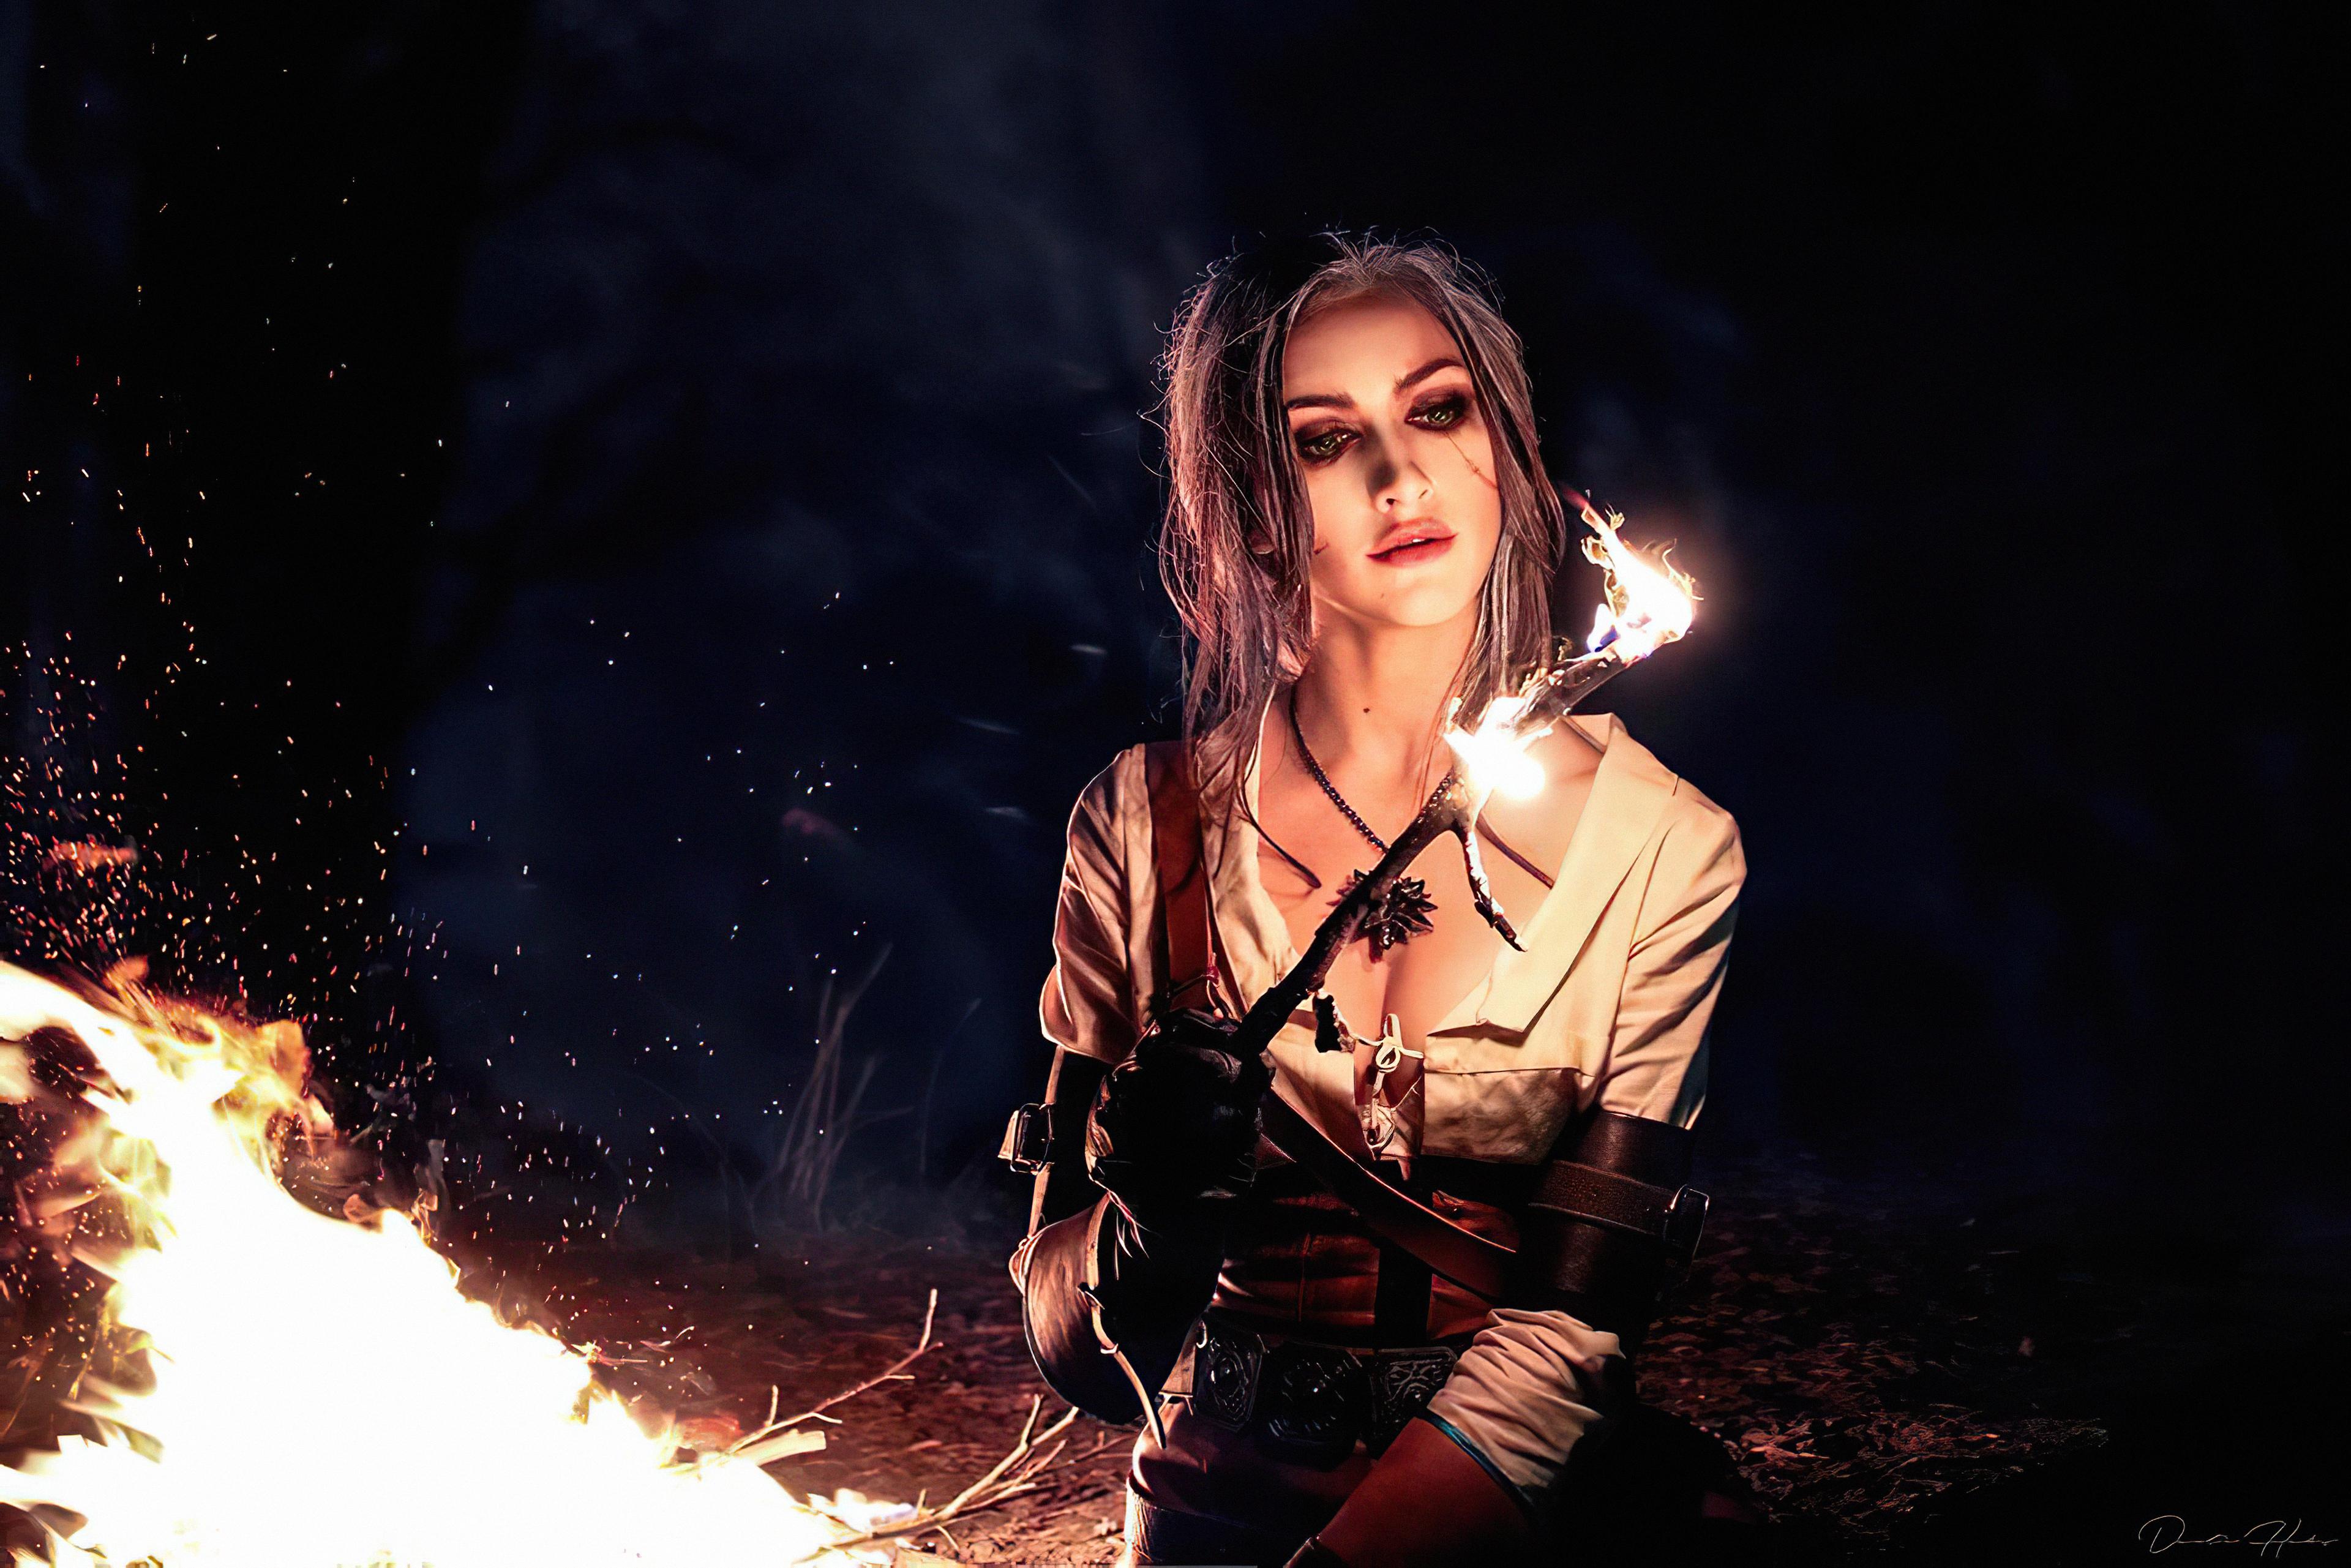 ciri the witcher cosplay 1589582955 - Ciri The Witcher Cosplay - Ciri The Witcher Cosplay wallpapers